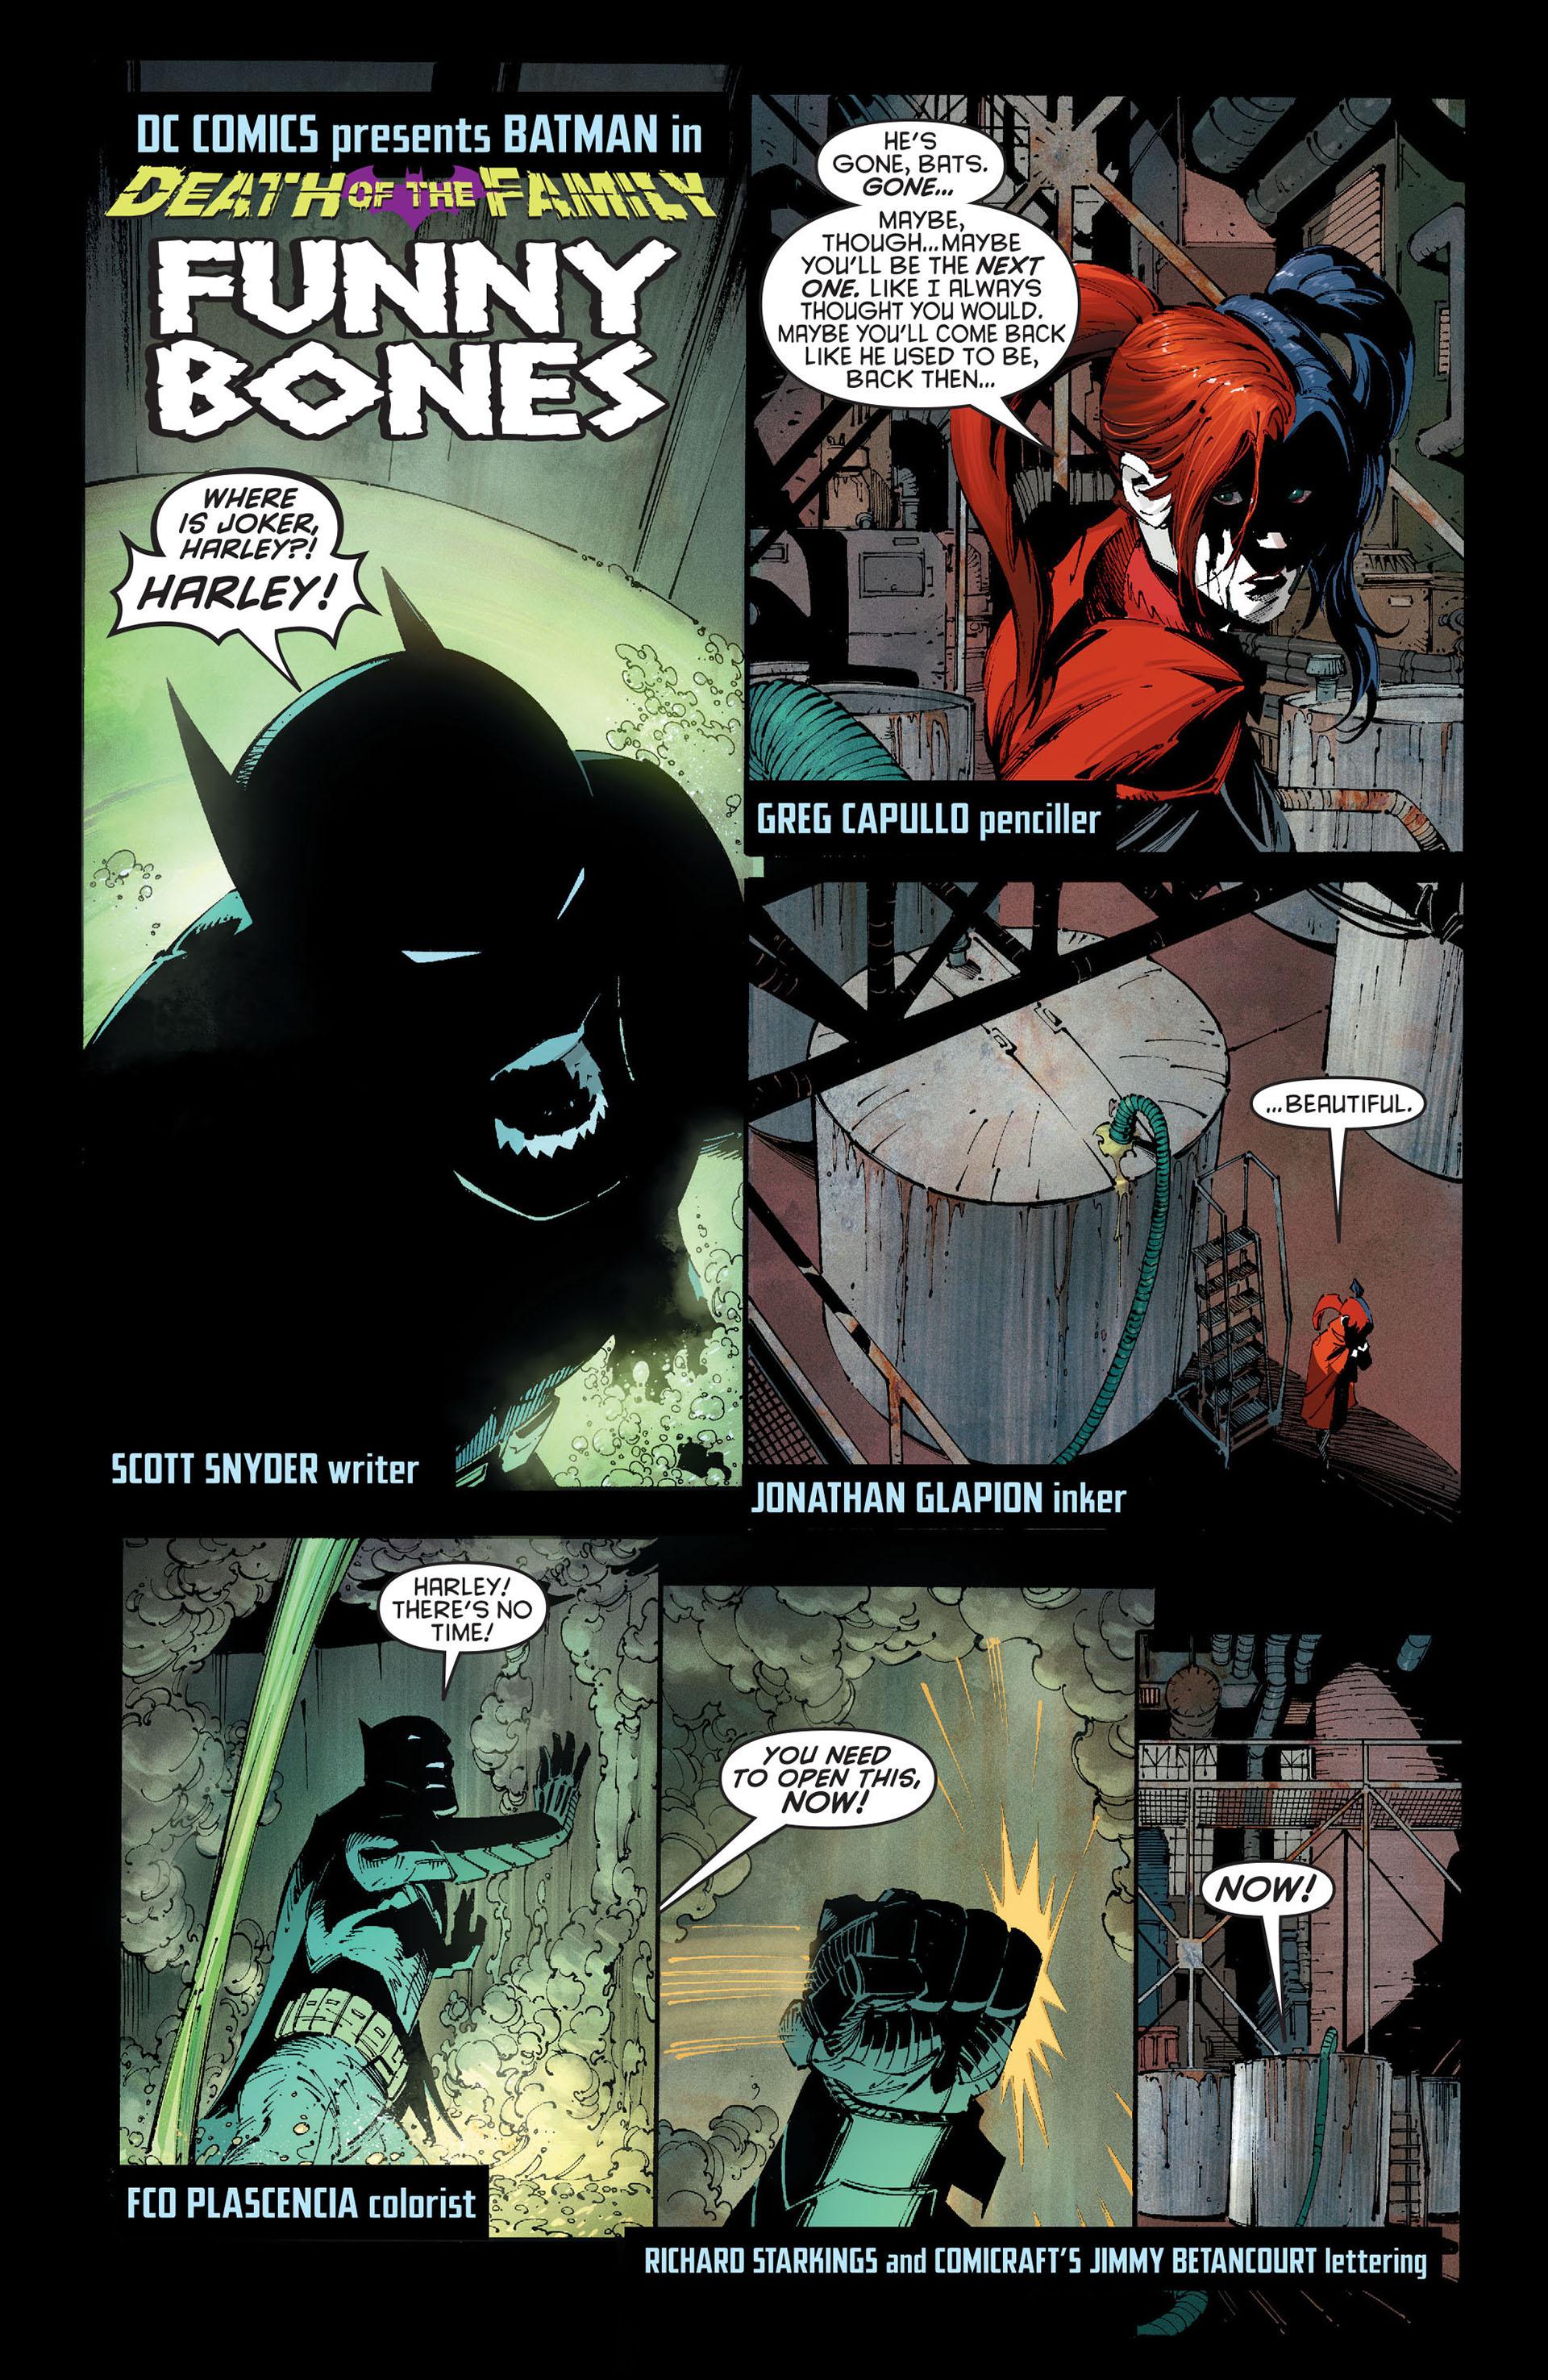 Harley Quinn : Death of the Family Harley7-3c2cc03